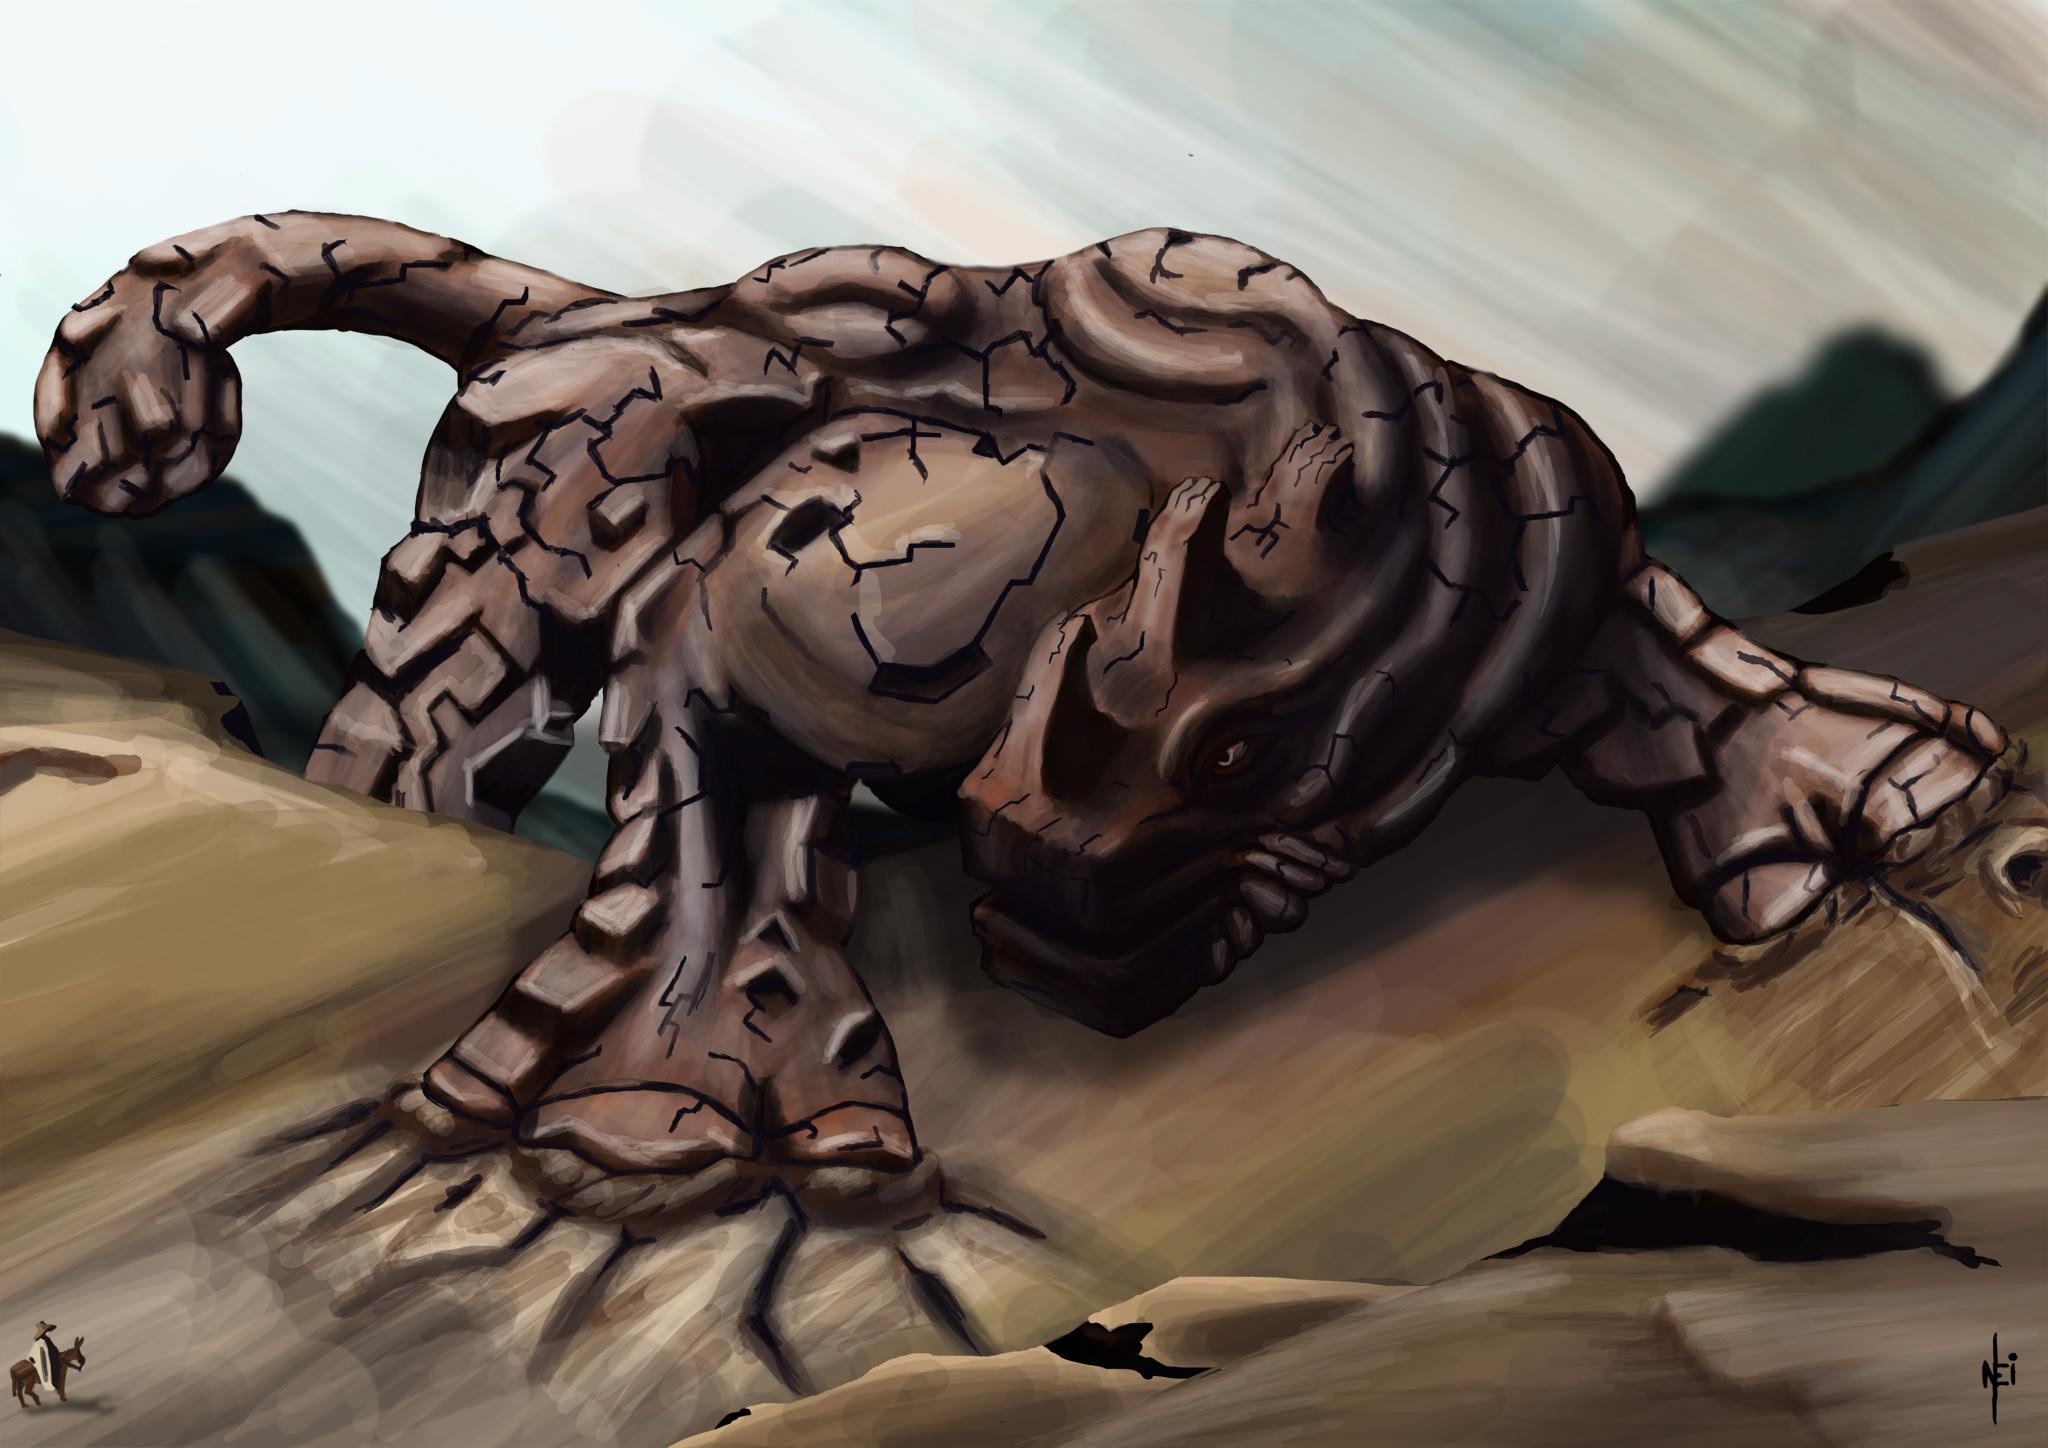 Gor - Earth Colossus. by Mulungu